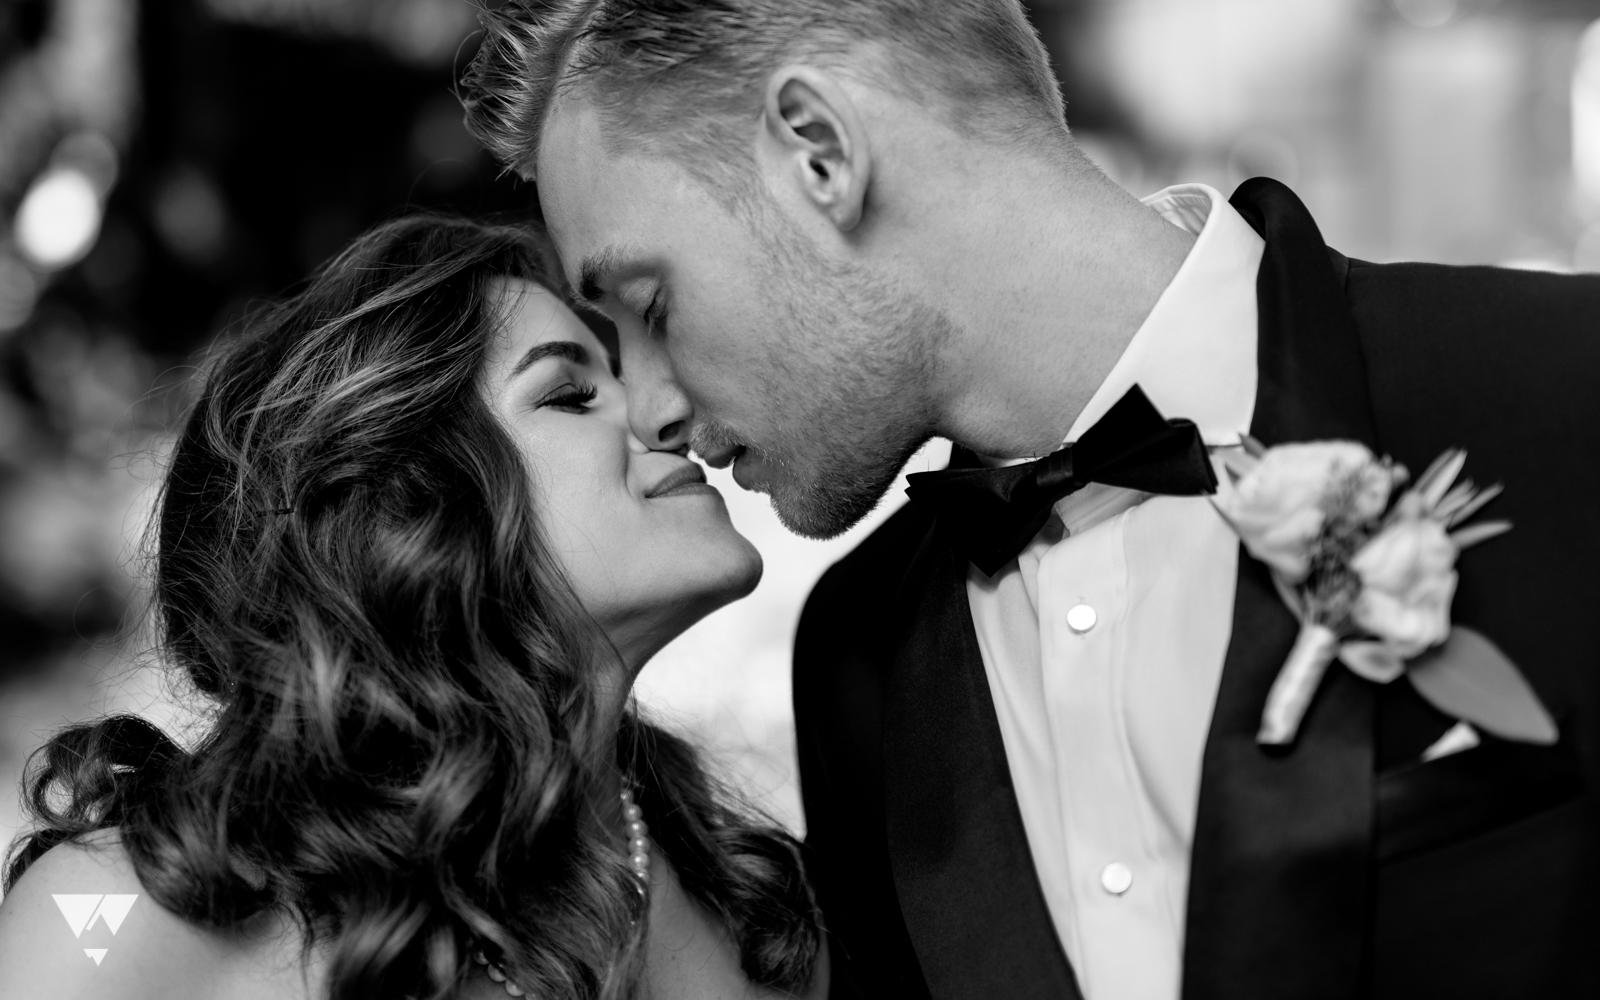 herastudios_wedding_sadaf_logan_hera_selects_web-35.jpg